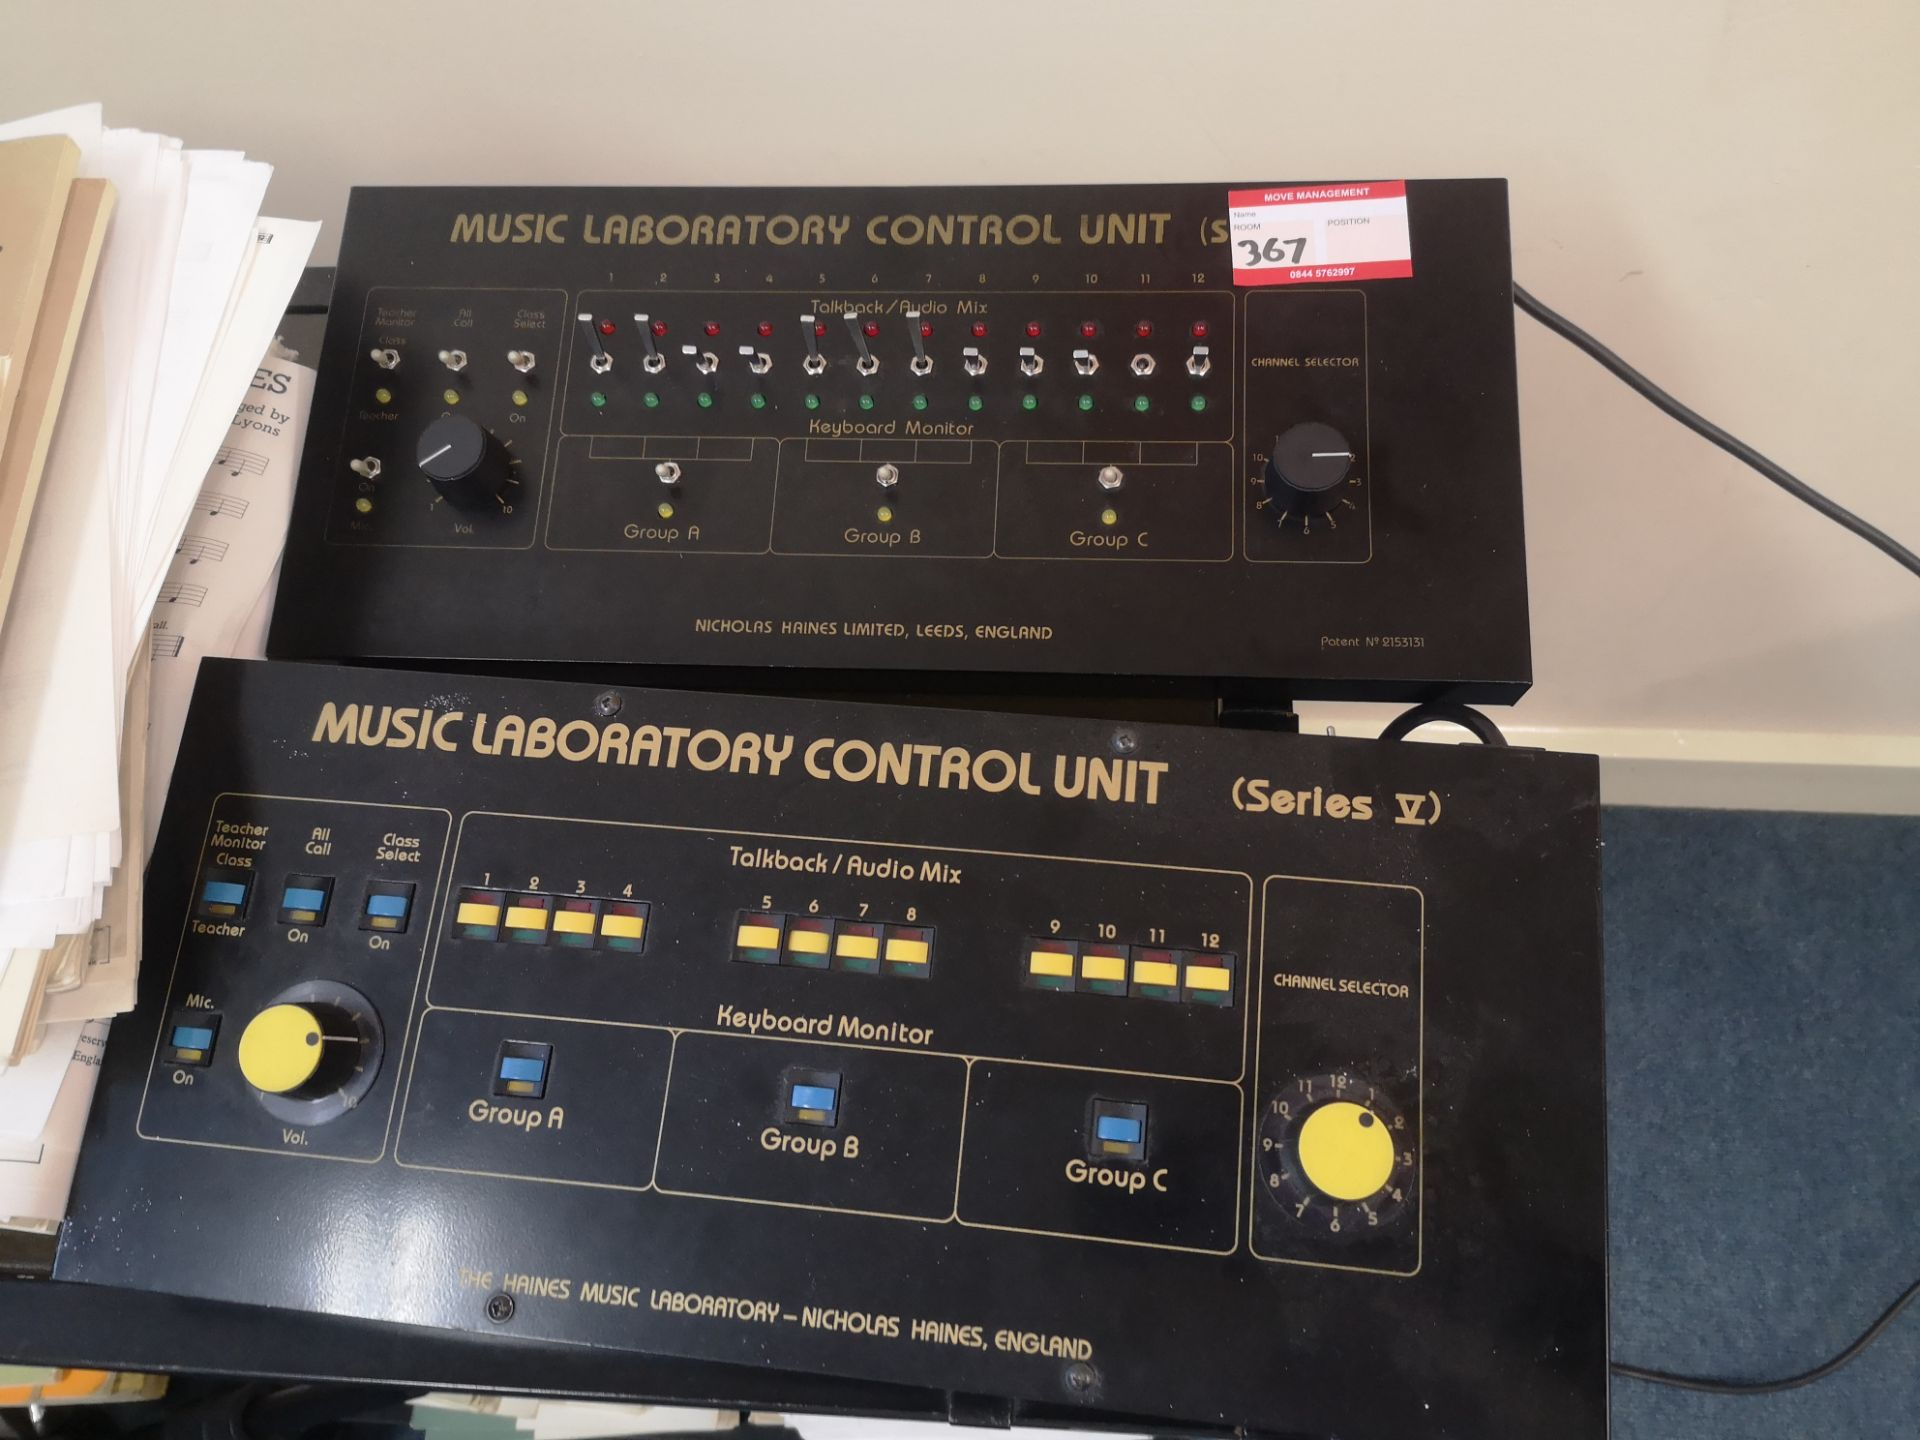 Lot 367 - Vintage music laboratory control units